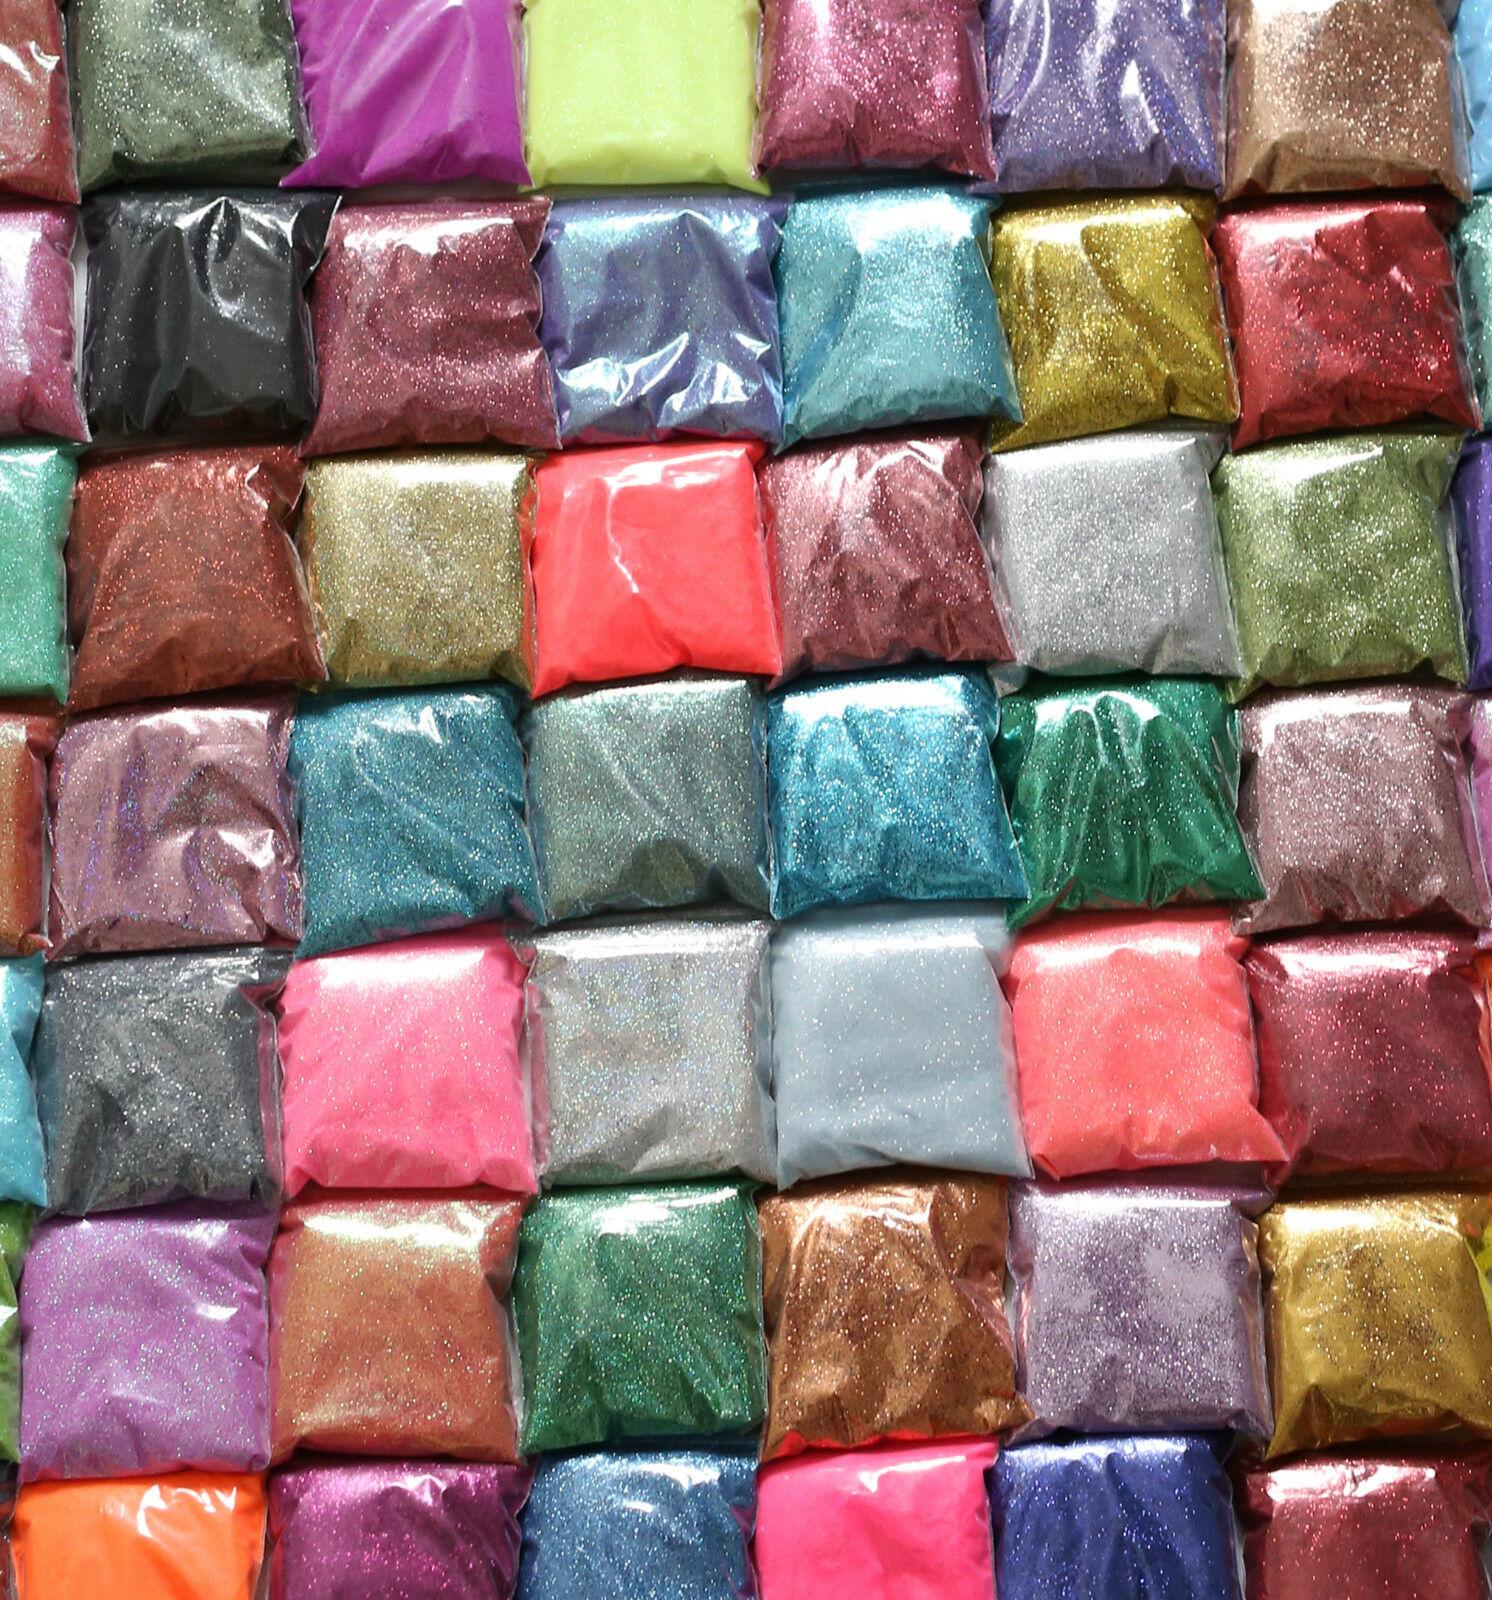 BUY 5 GET 5 FREE 100g Glitter premium bulk bag iridescent cheap holographic